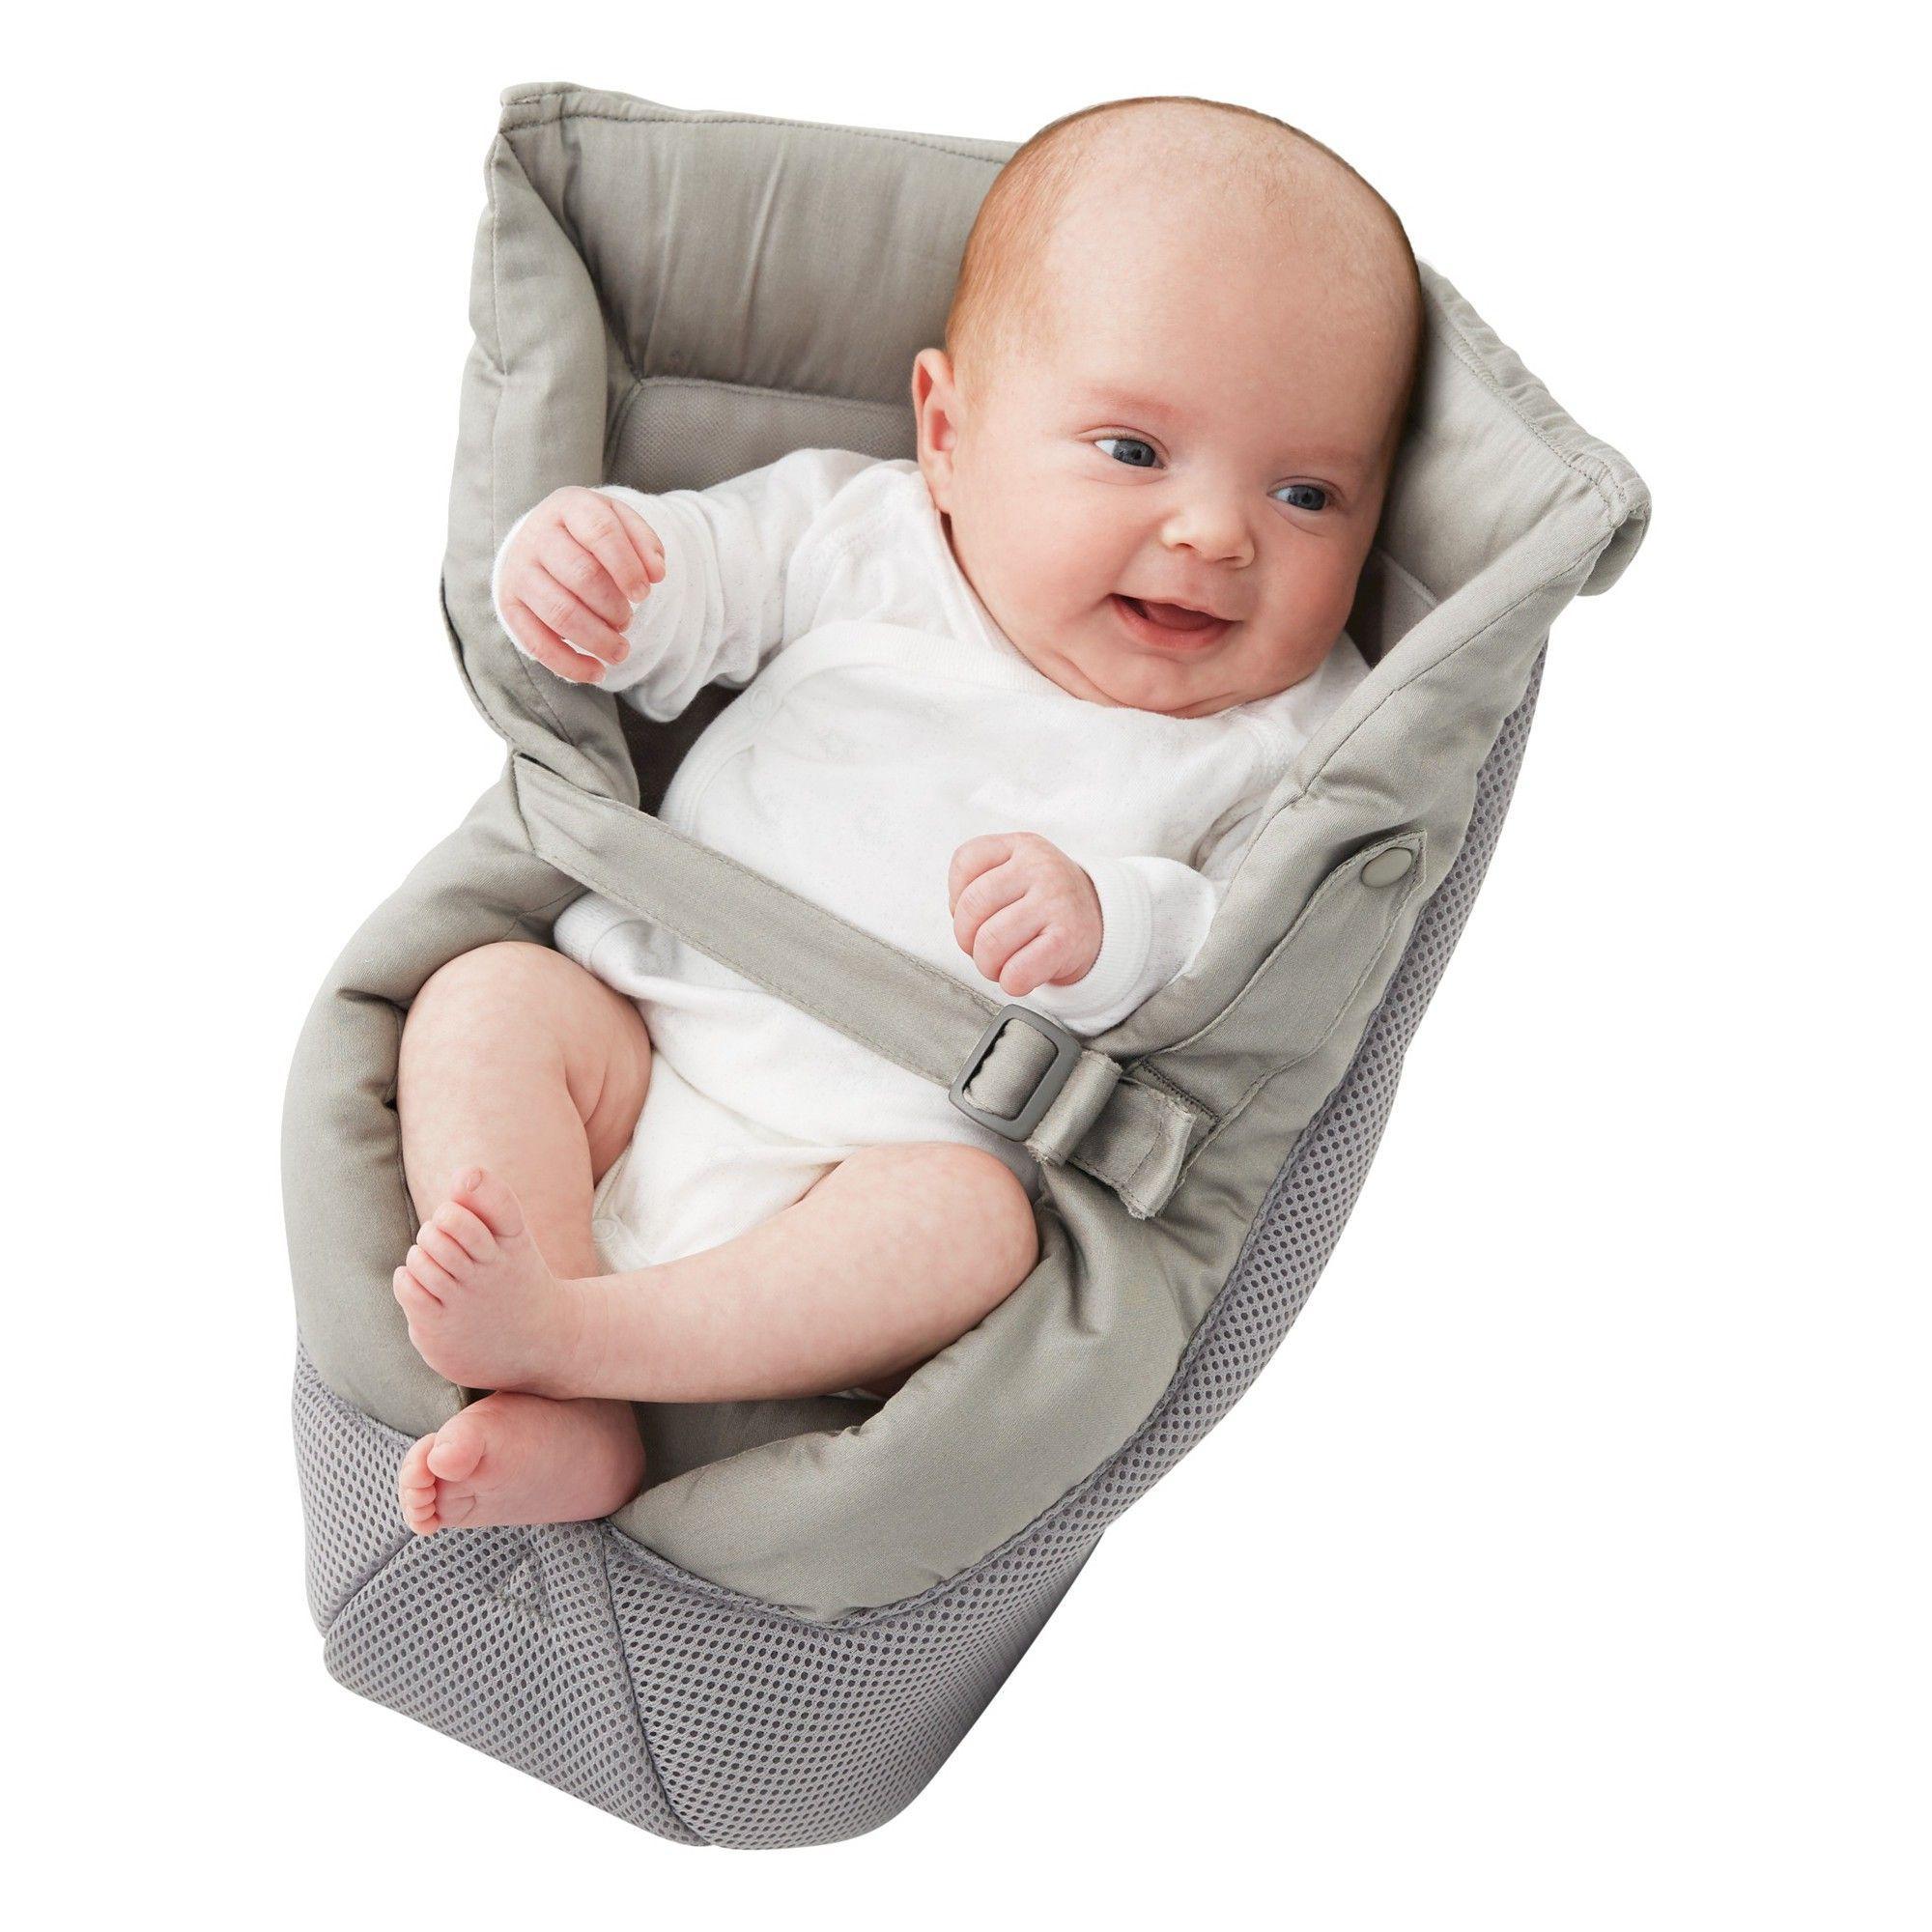 08ab249620d Ergobaby Infant Insert Performance Cool Mesh - Gray